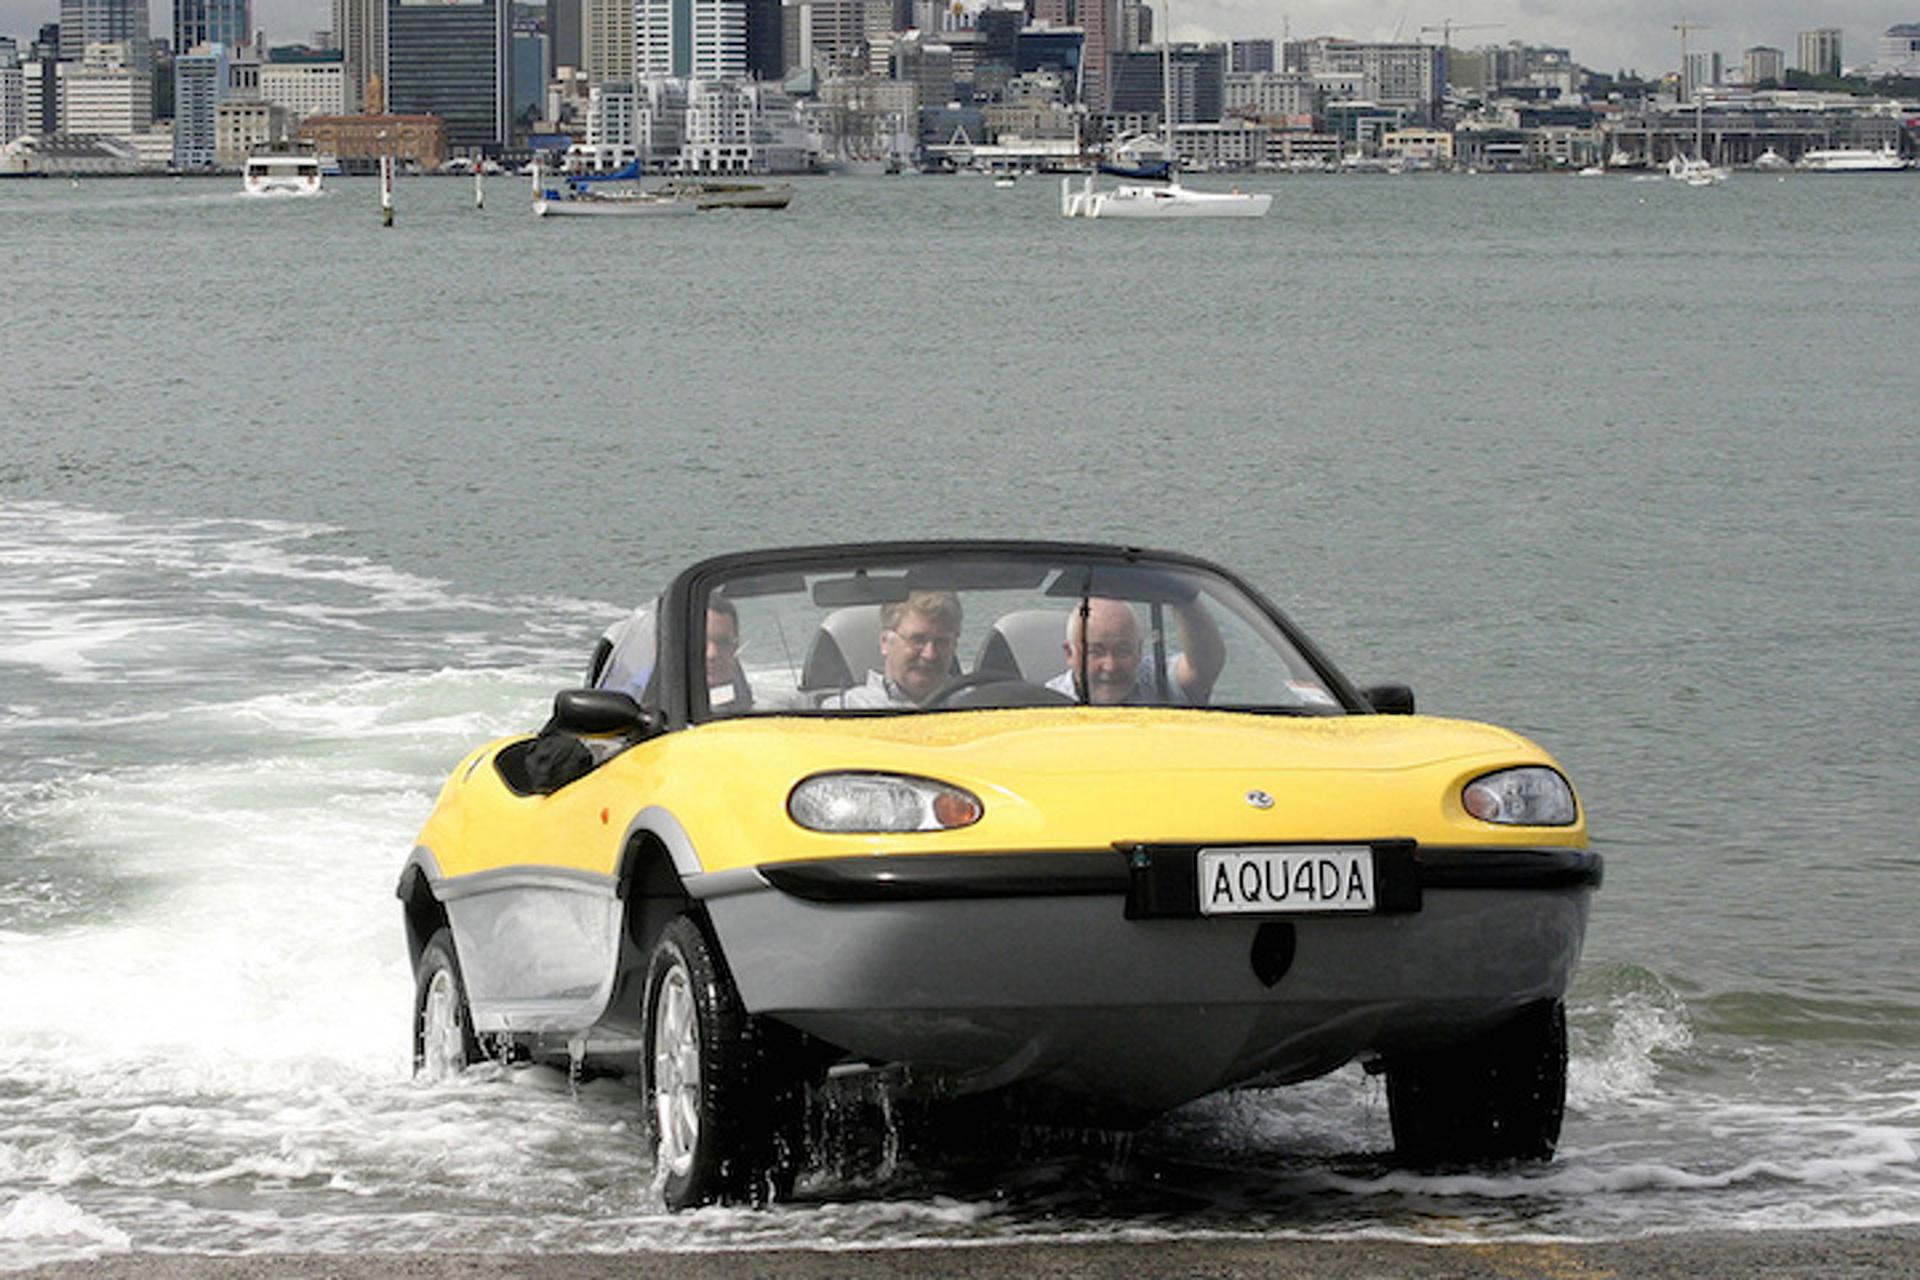 Gibbs is Selling Off 20 of Its Aquada Amphibious Sports Cars